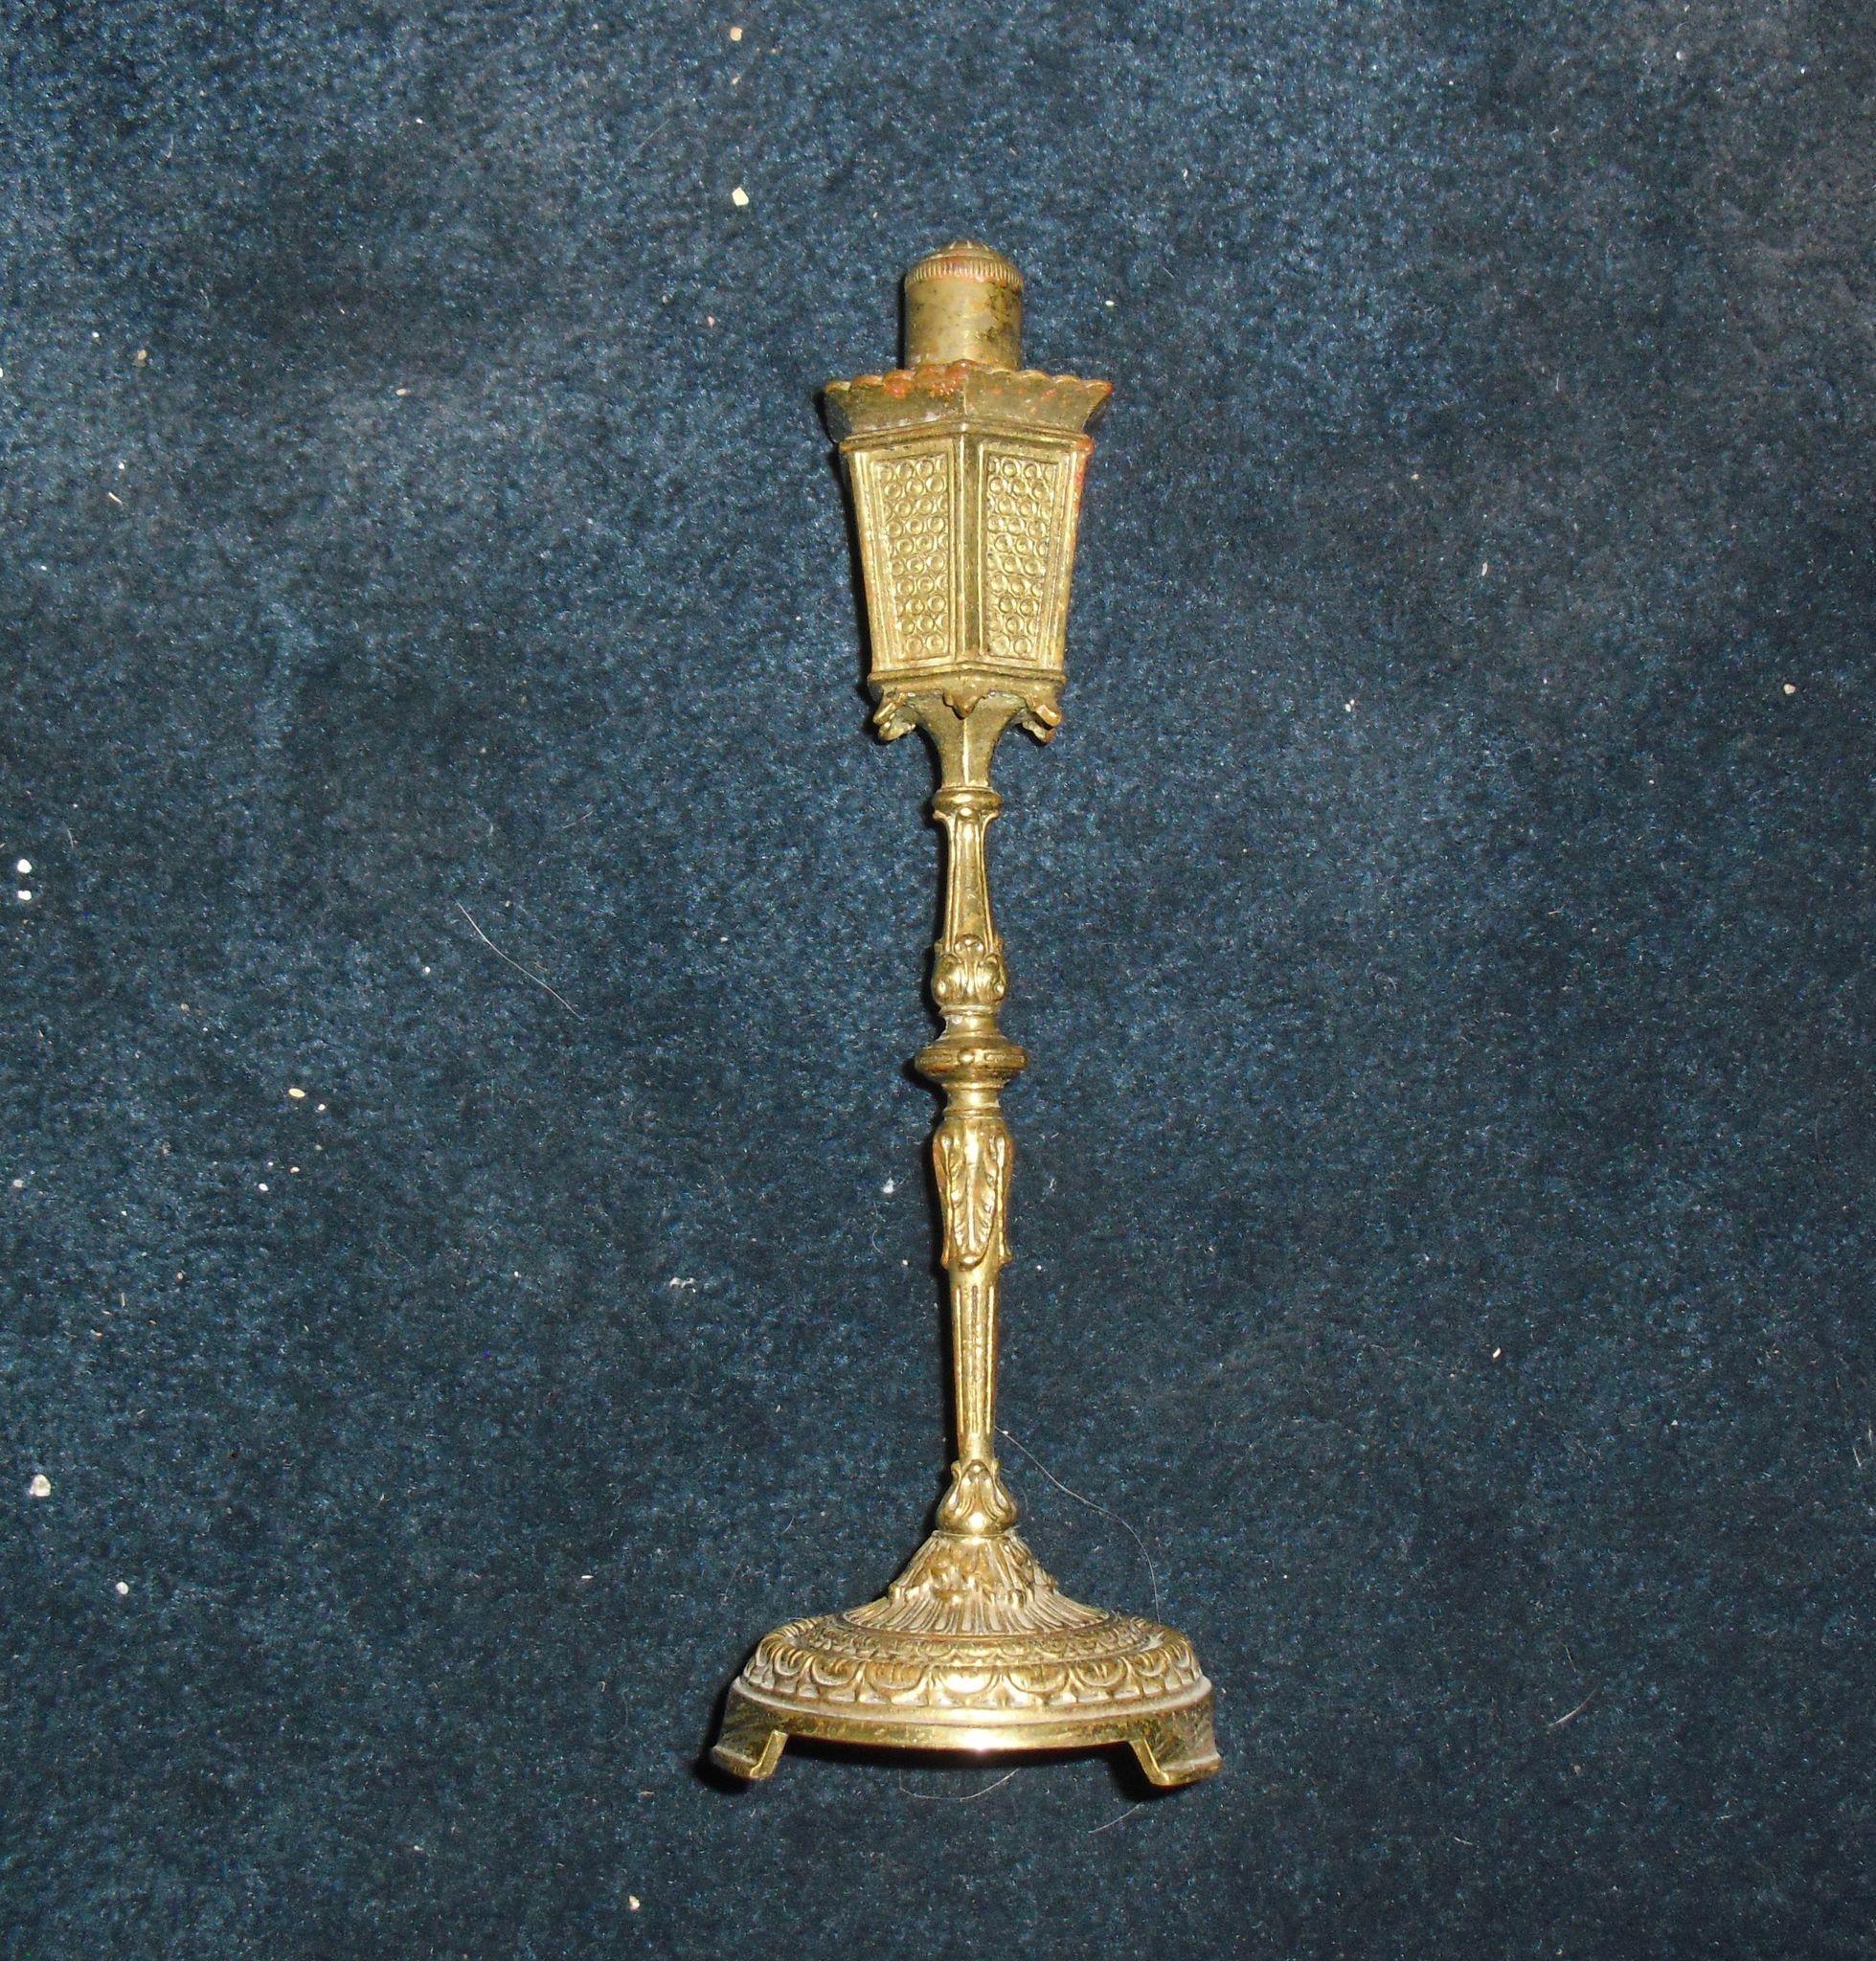 Cast Brass Street Lamp Cigarette Lighter